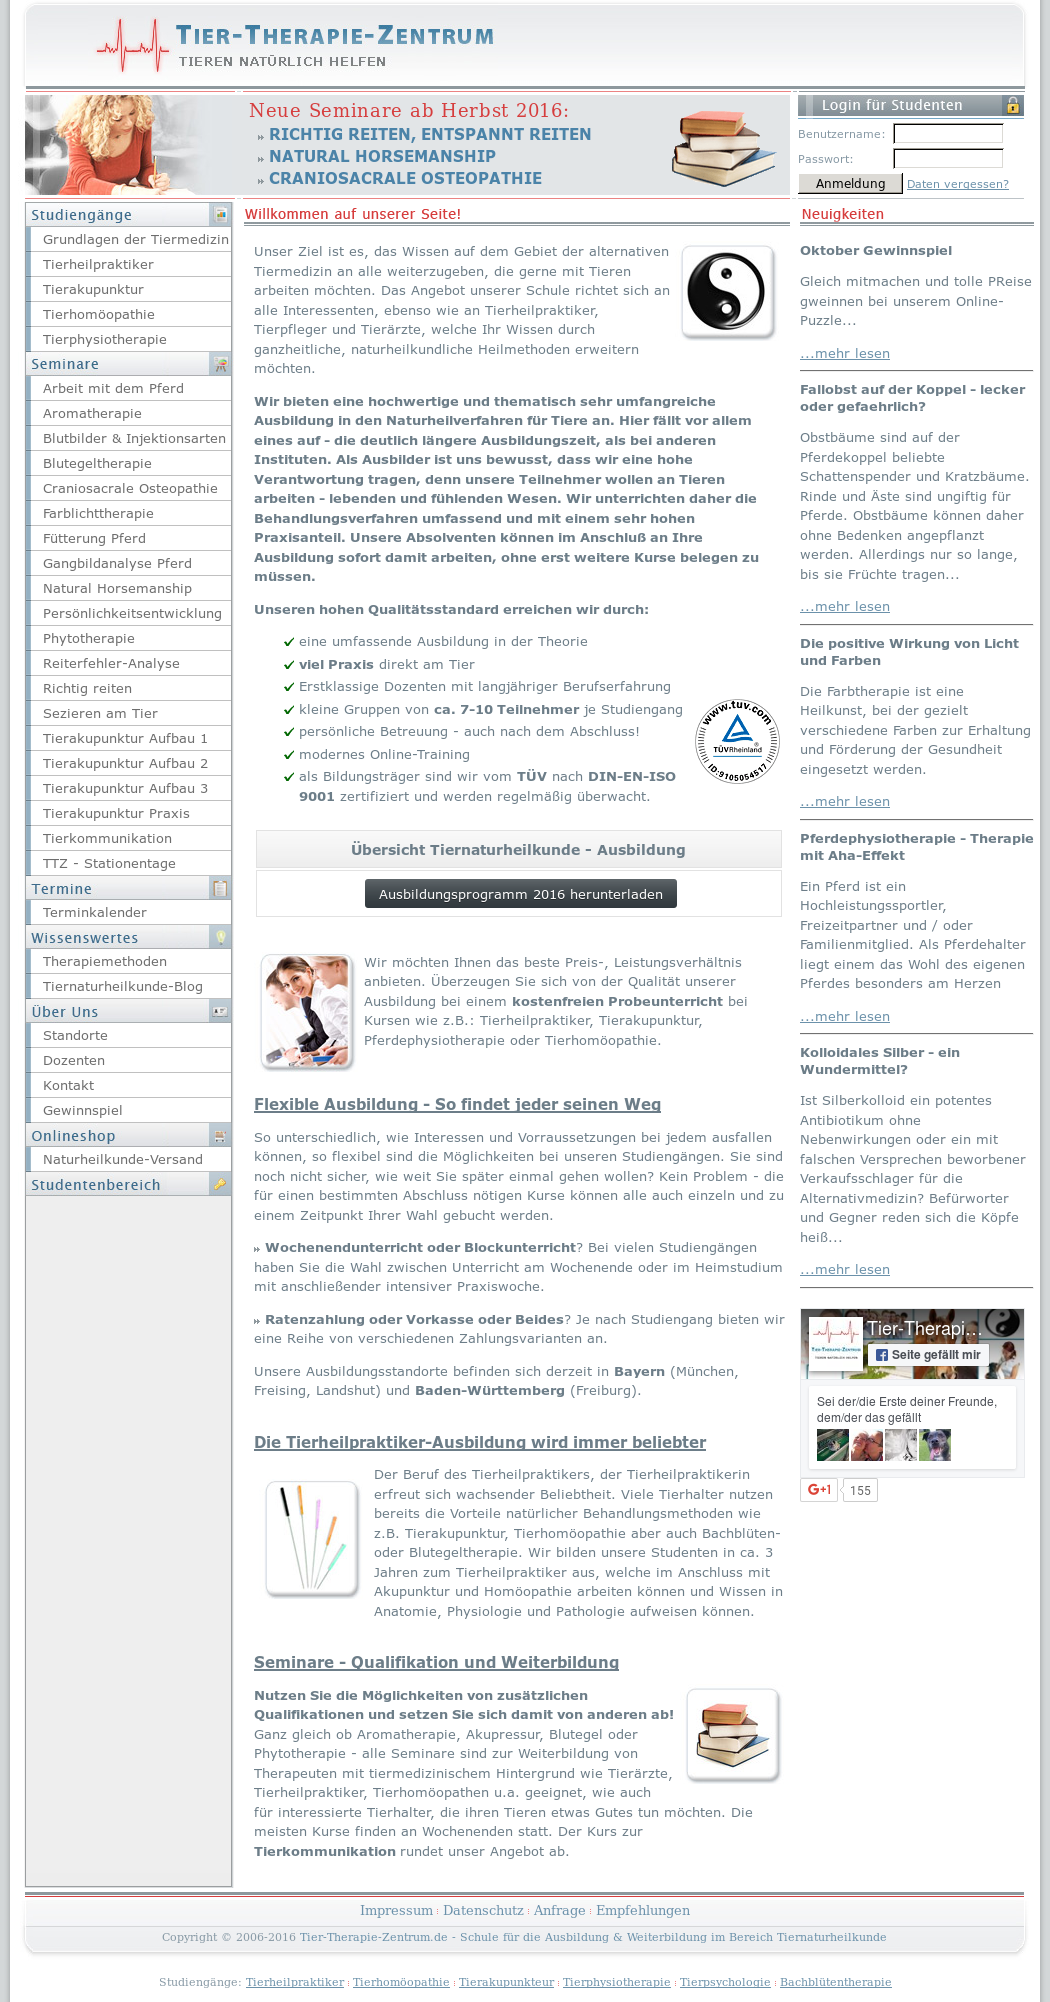 Tier-therapie-zentrum Competitors, Revenue and Employees - Owler ...